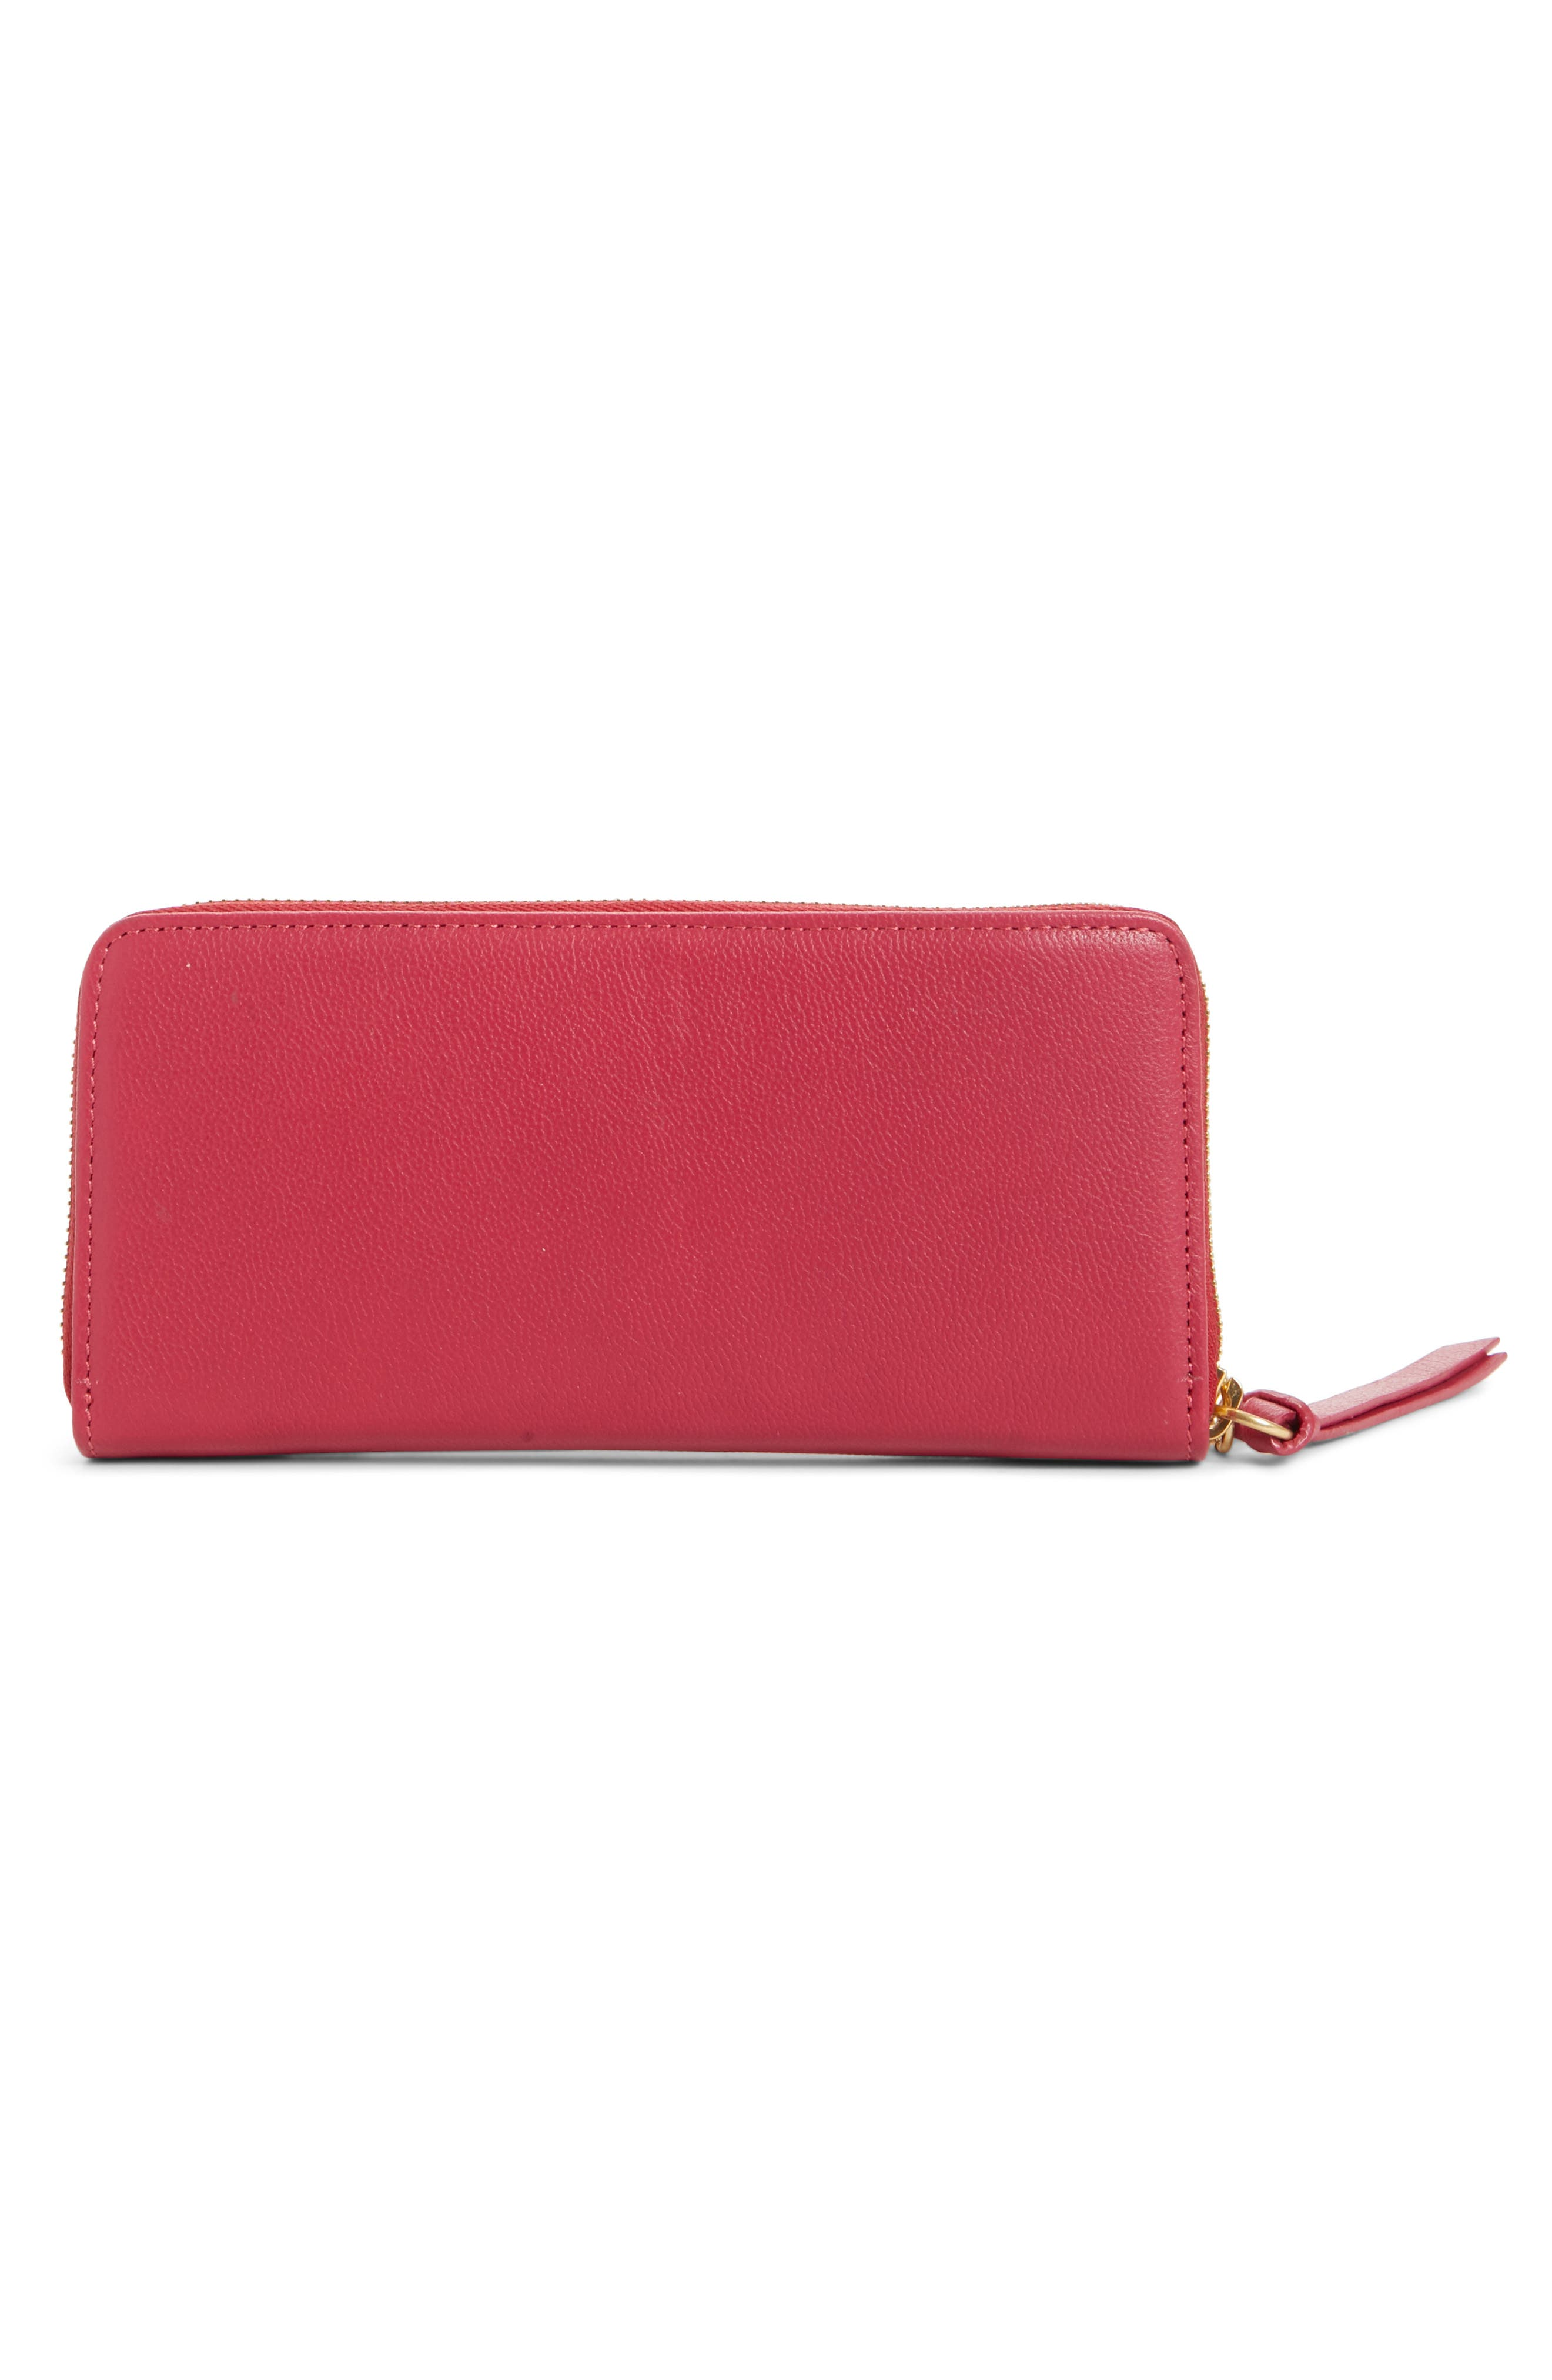 Mino Zip Around Leather Wallet,                             Alternate thumbnail 3, color,                             650